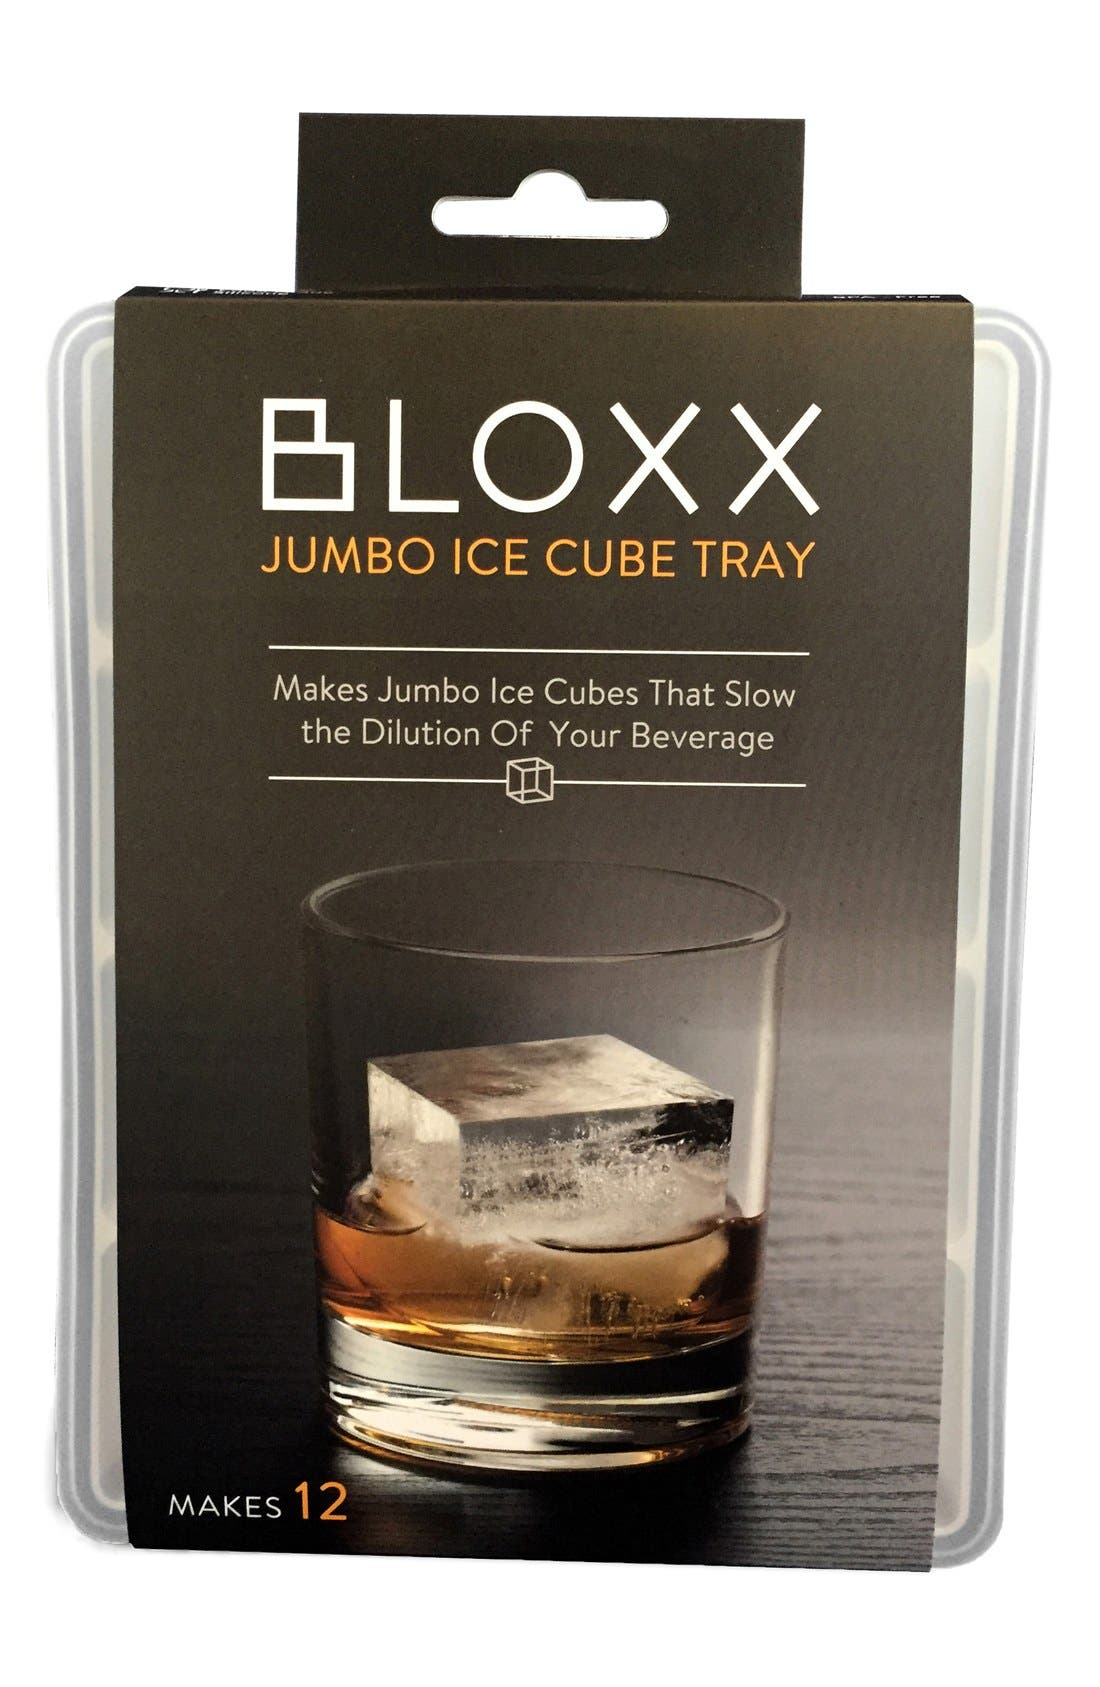 The Original WHISKEY BALL 'Bloxx' Jumbo Ice Tray